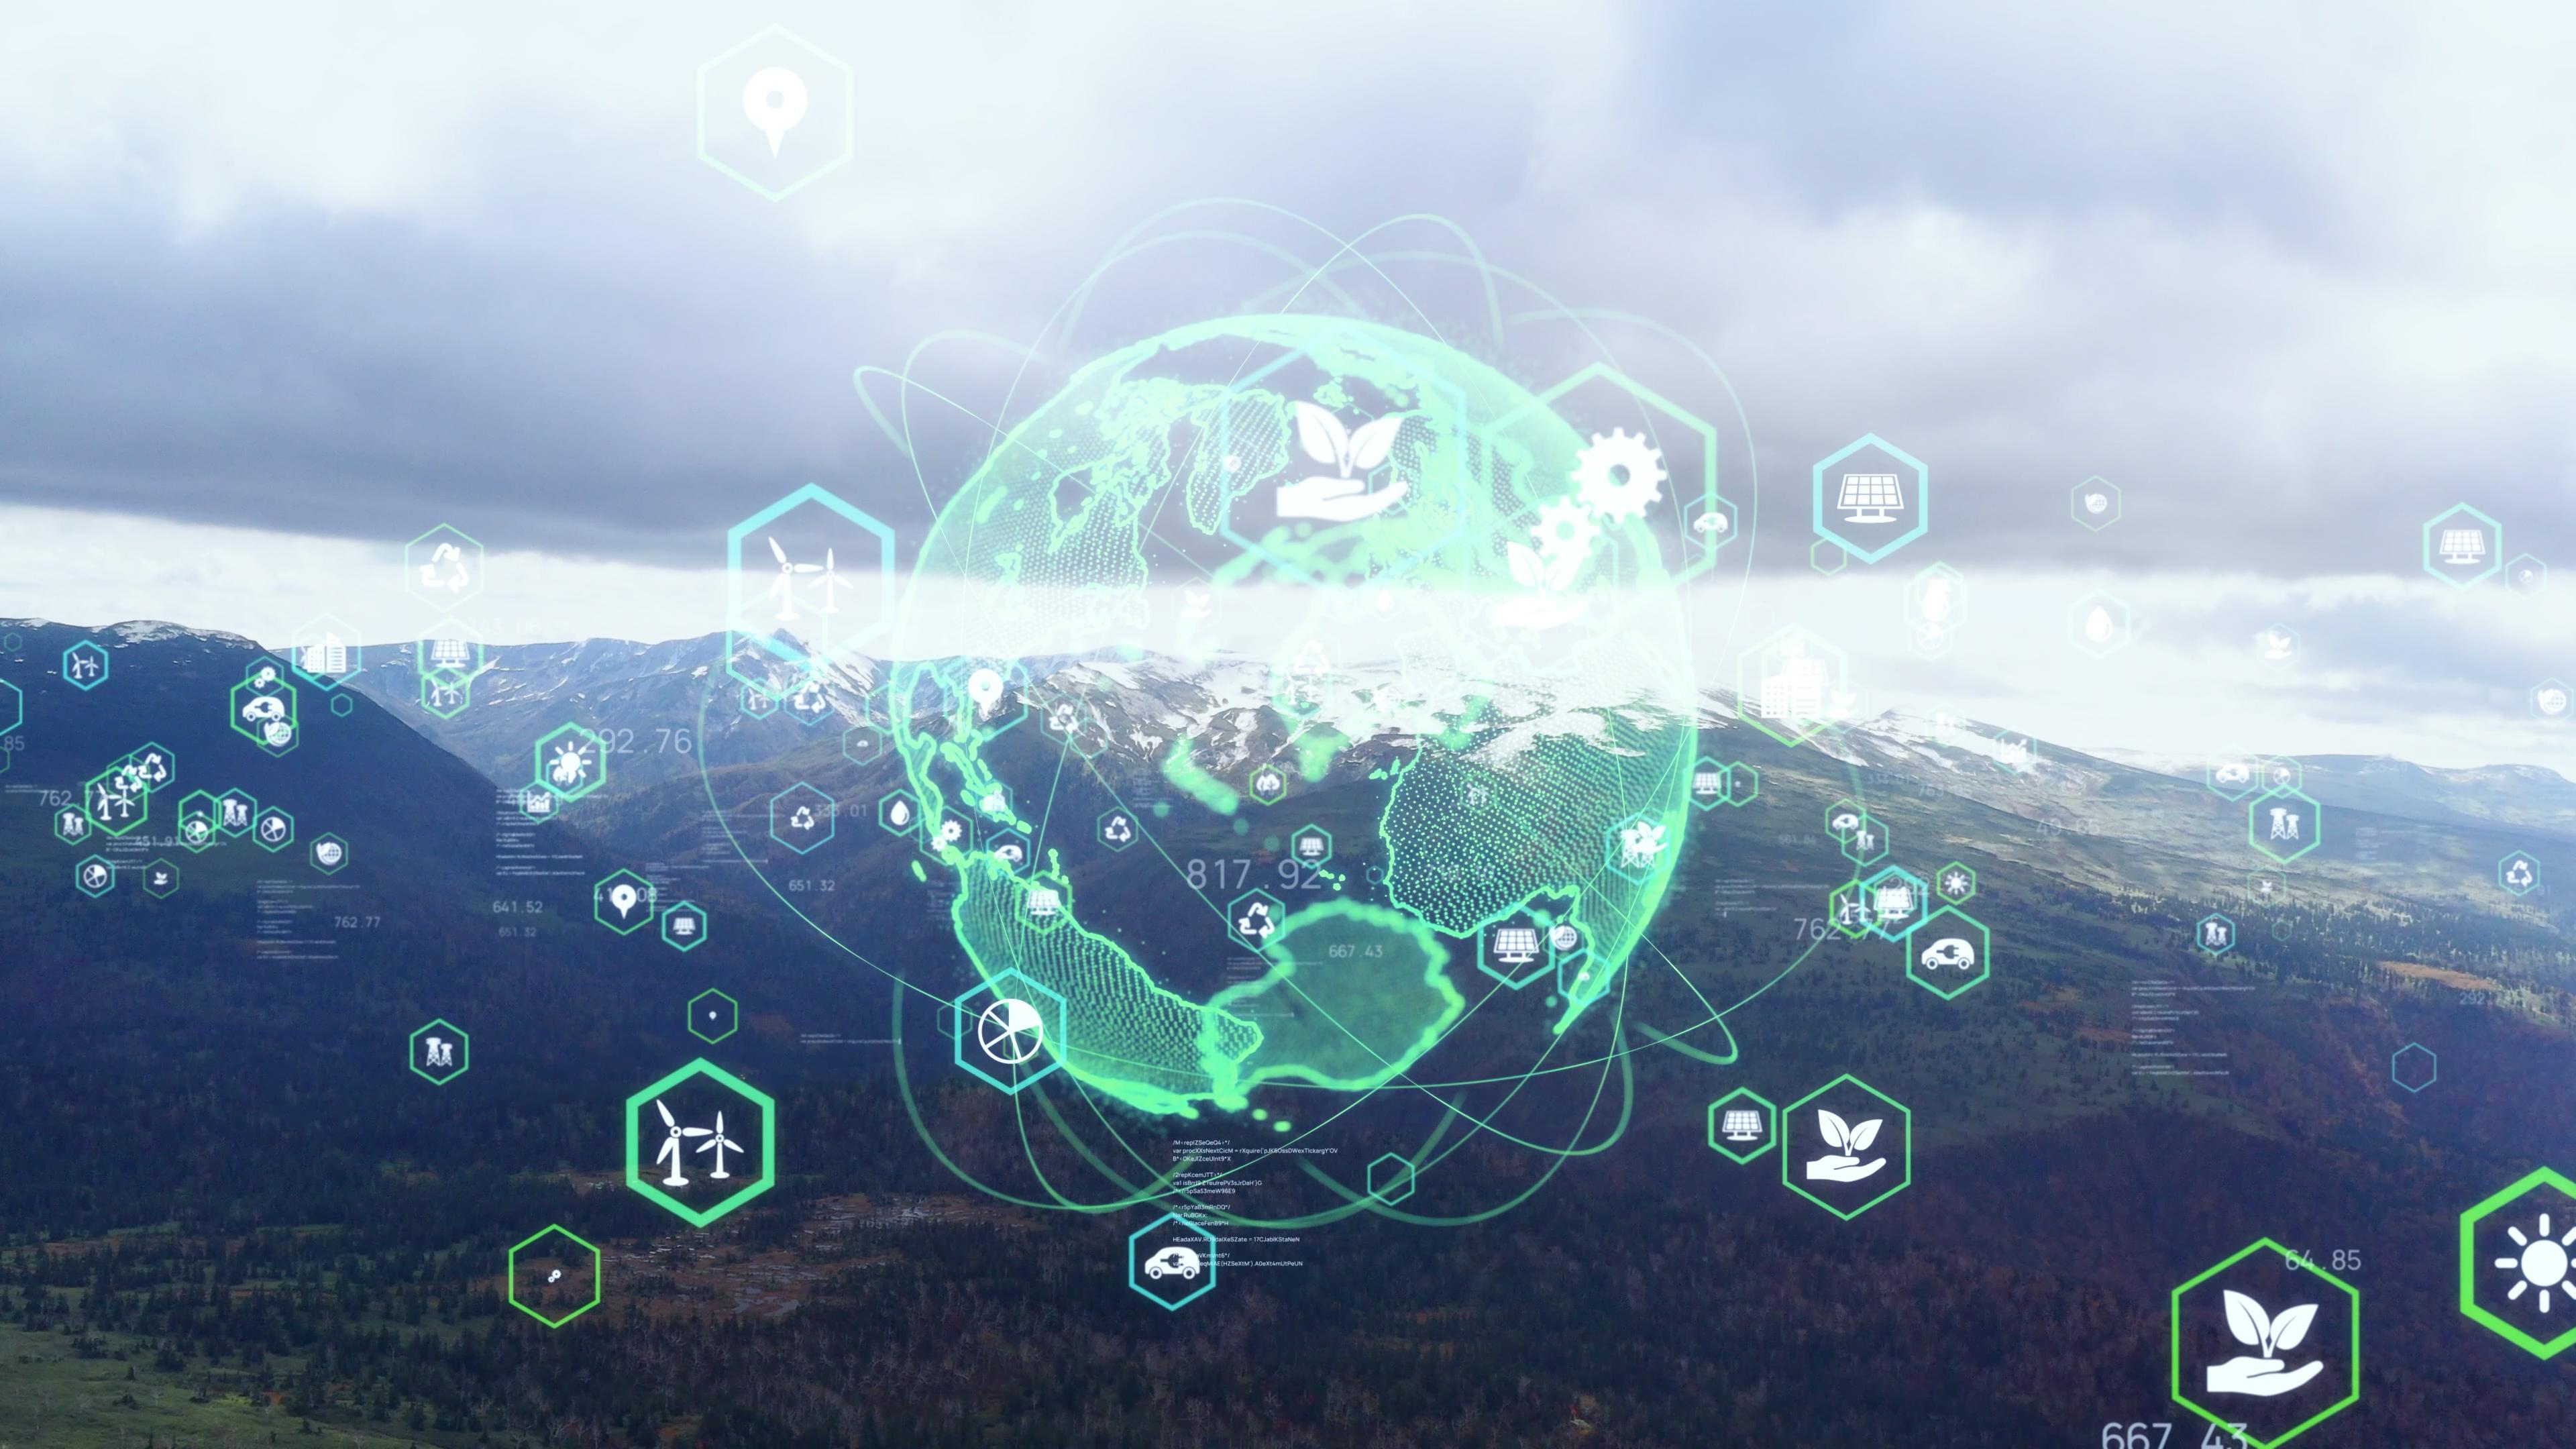 nachhaltigkeit-schaebens-gesichtspflege-znu-innovationsmotor